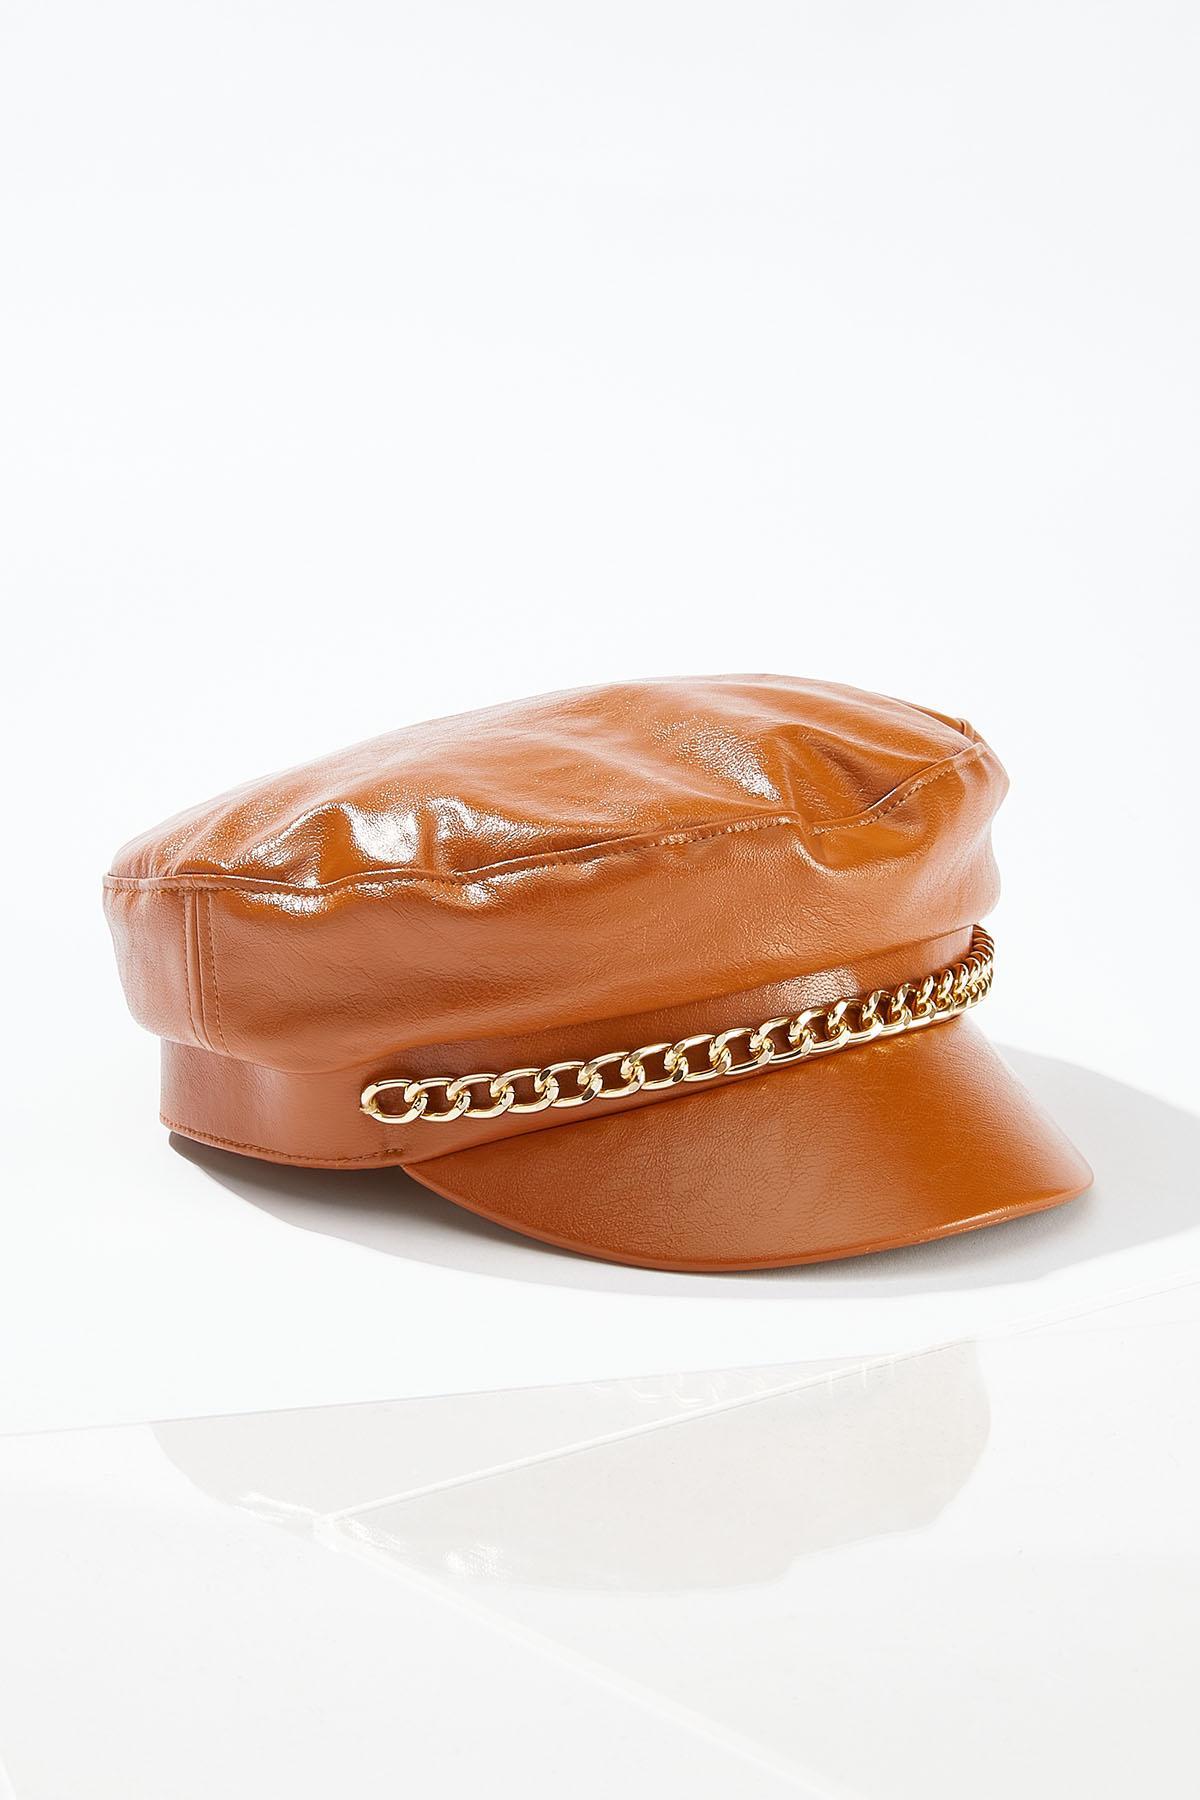 Chain Detail Cabbie Hat